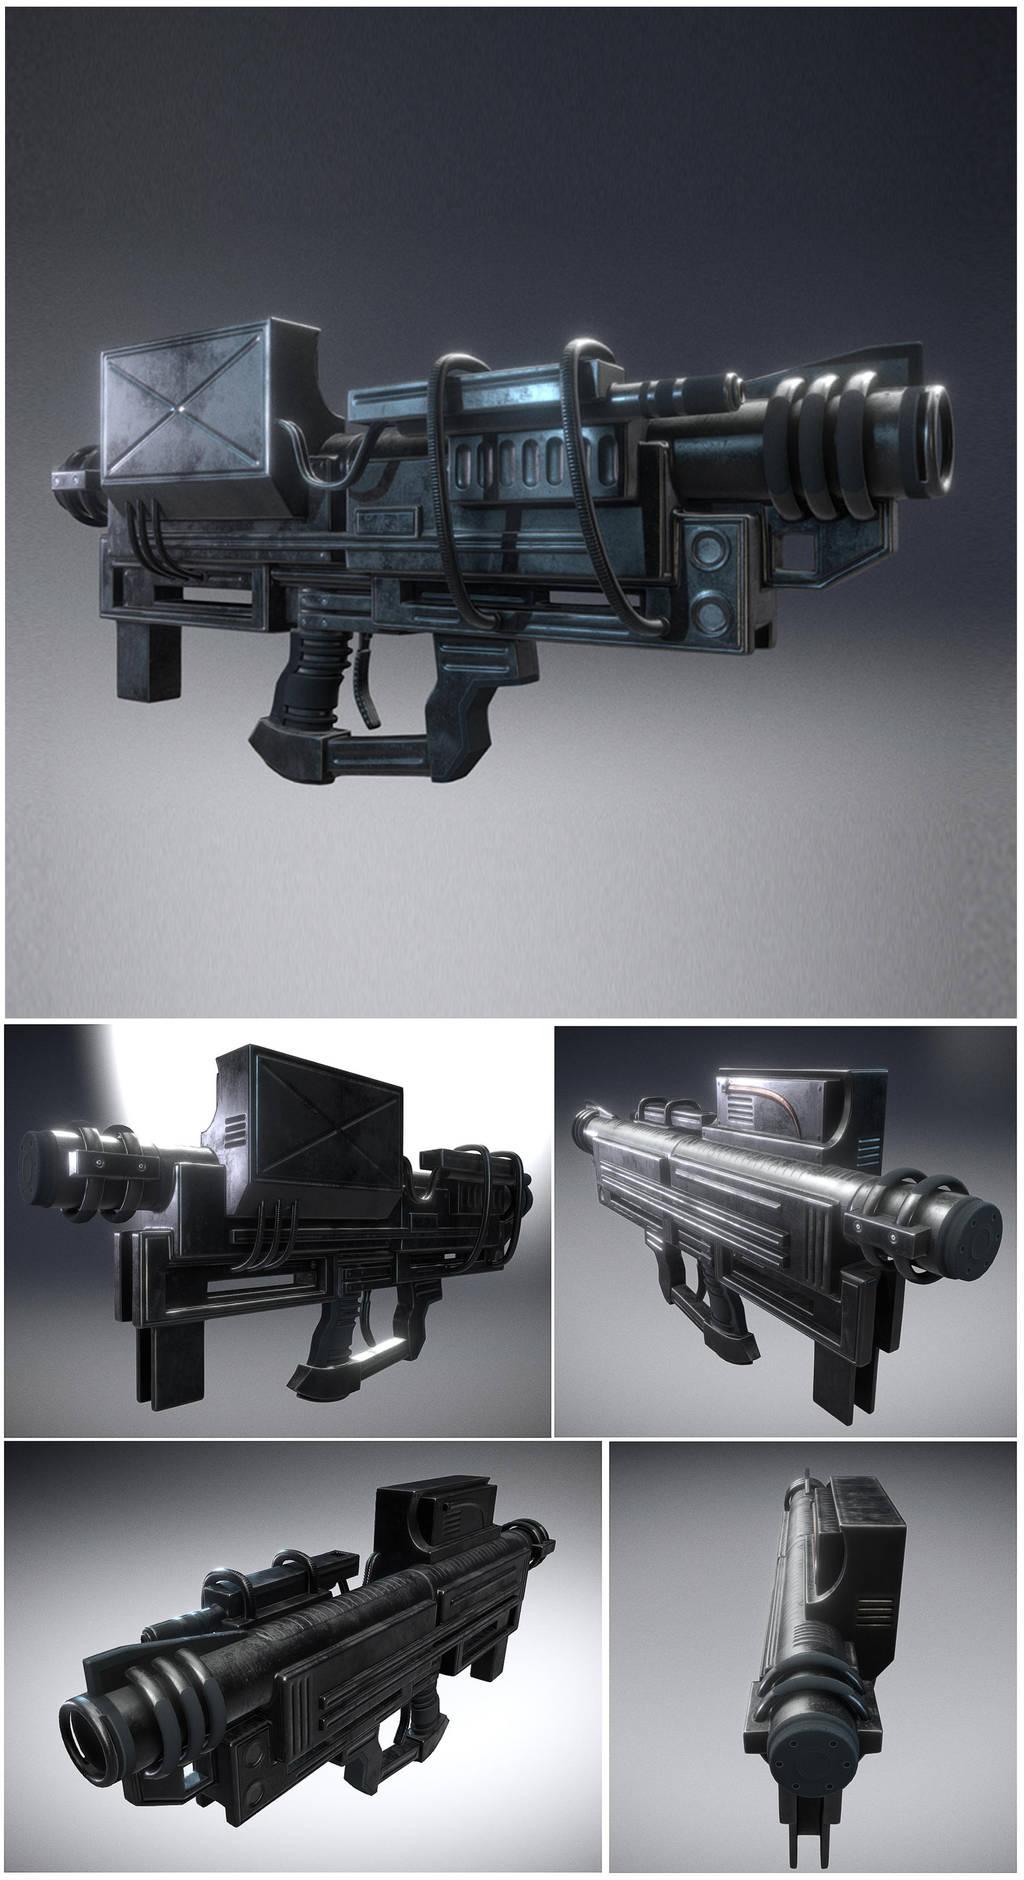 Heavy Blaster by DennisH2010